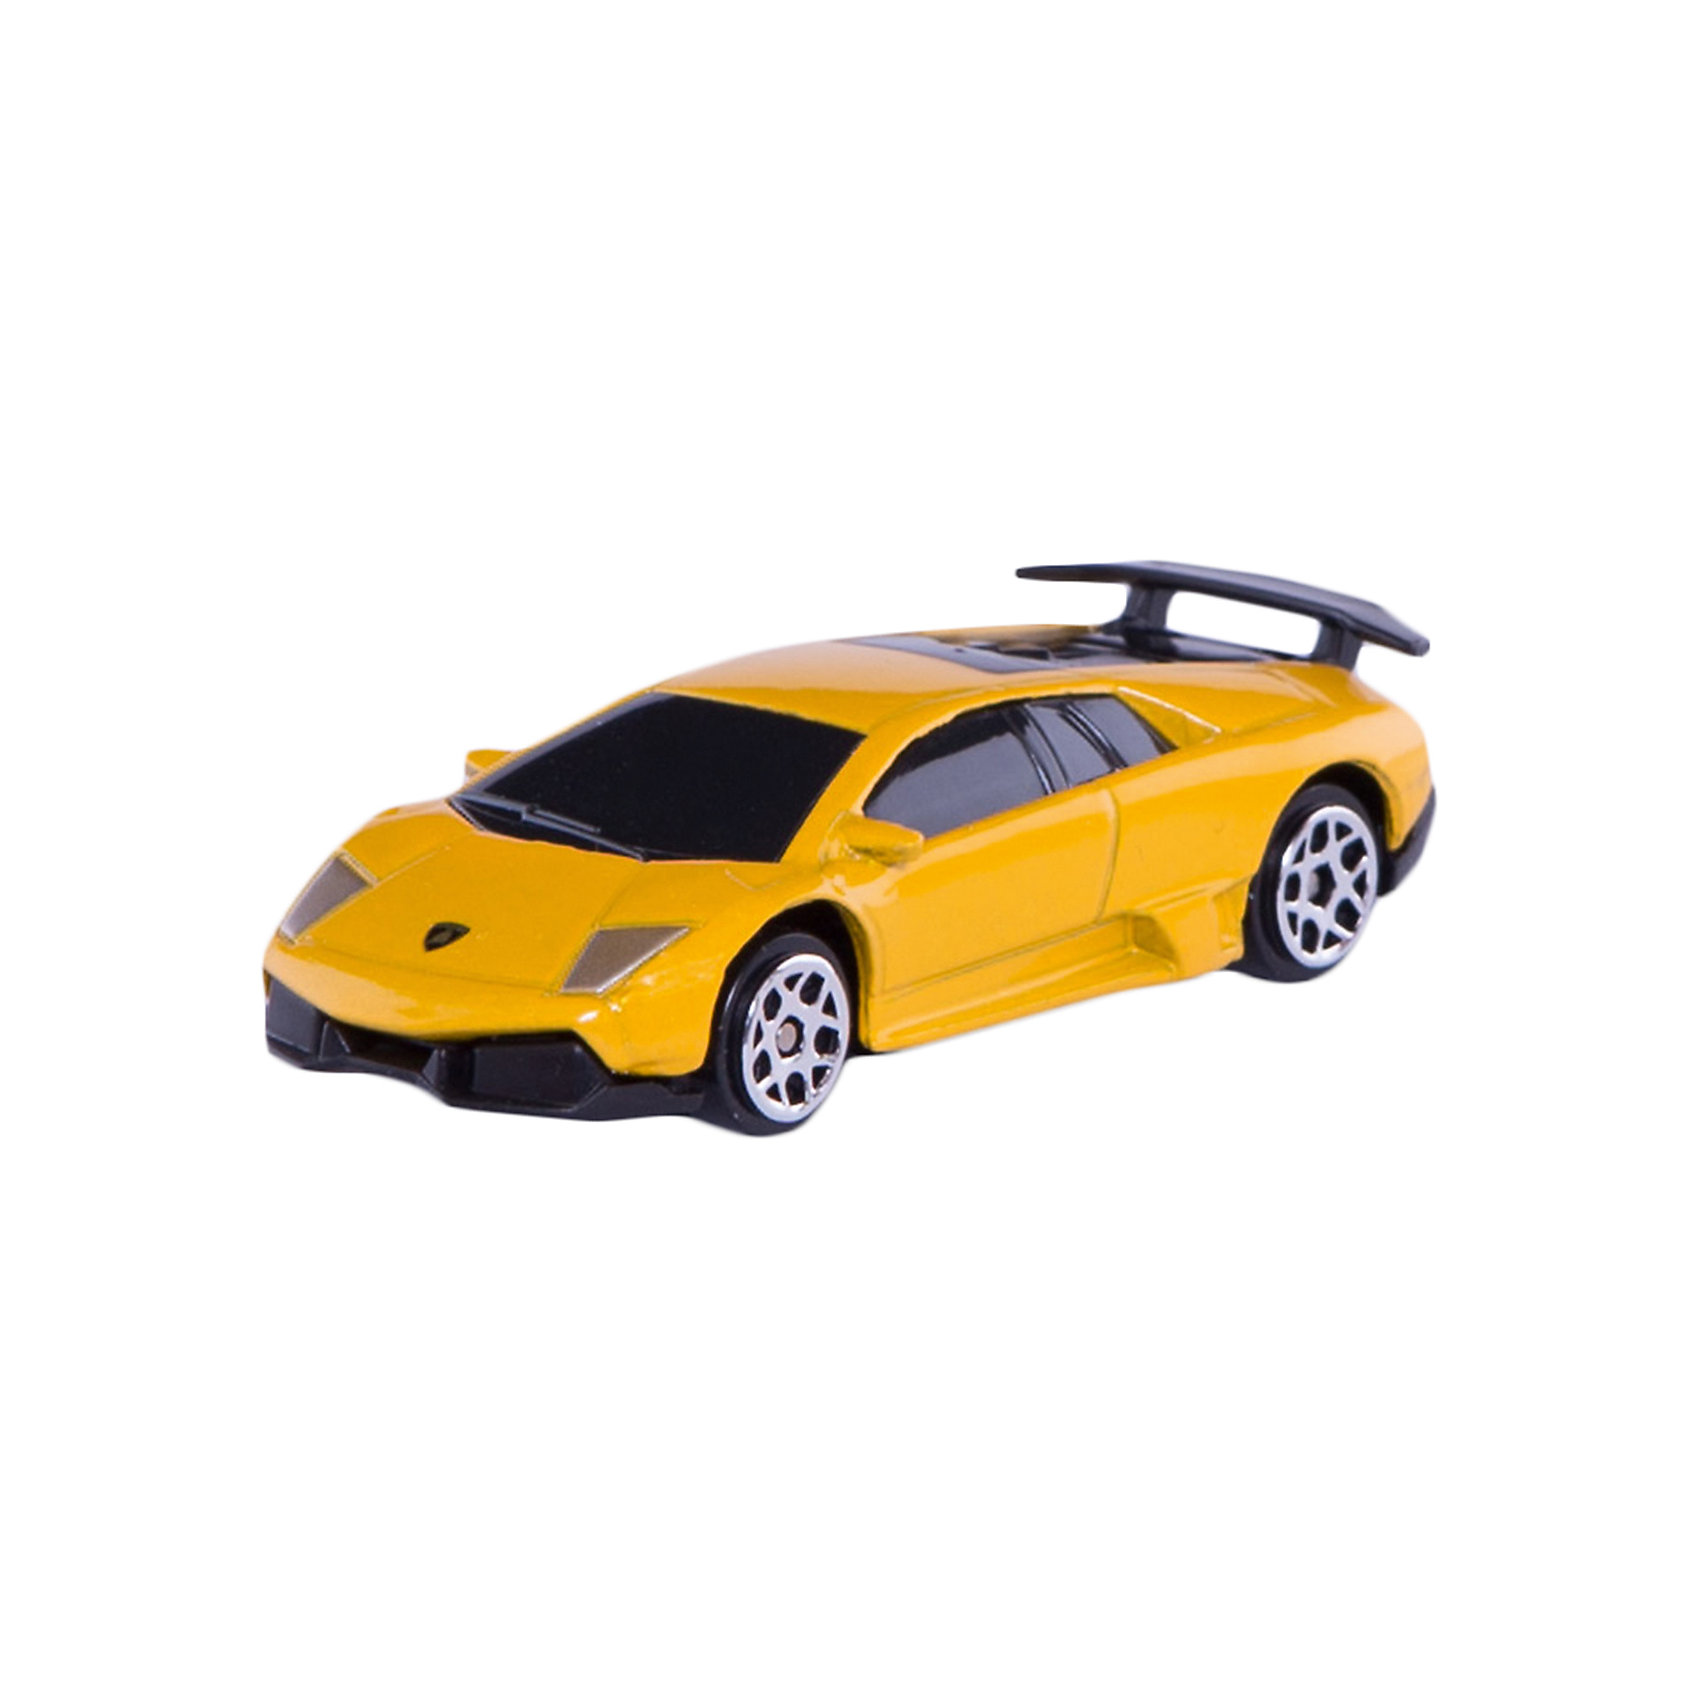 Машинка Lamborghini Murcielago LP670-4 Jeans 3, AutotimeМашинки<br><br><br>Ширина мм: 90<br>Глубина мм: 42<br>Высота мм: 40<br>Вес г: 14<br>Возраст от месяцев: 36<br>Возраст до месяцев: 2147483647<br>Пол: Мужской<br>Возраст: Детский<br>SKU: 5584065